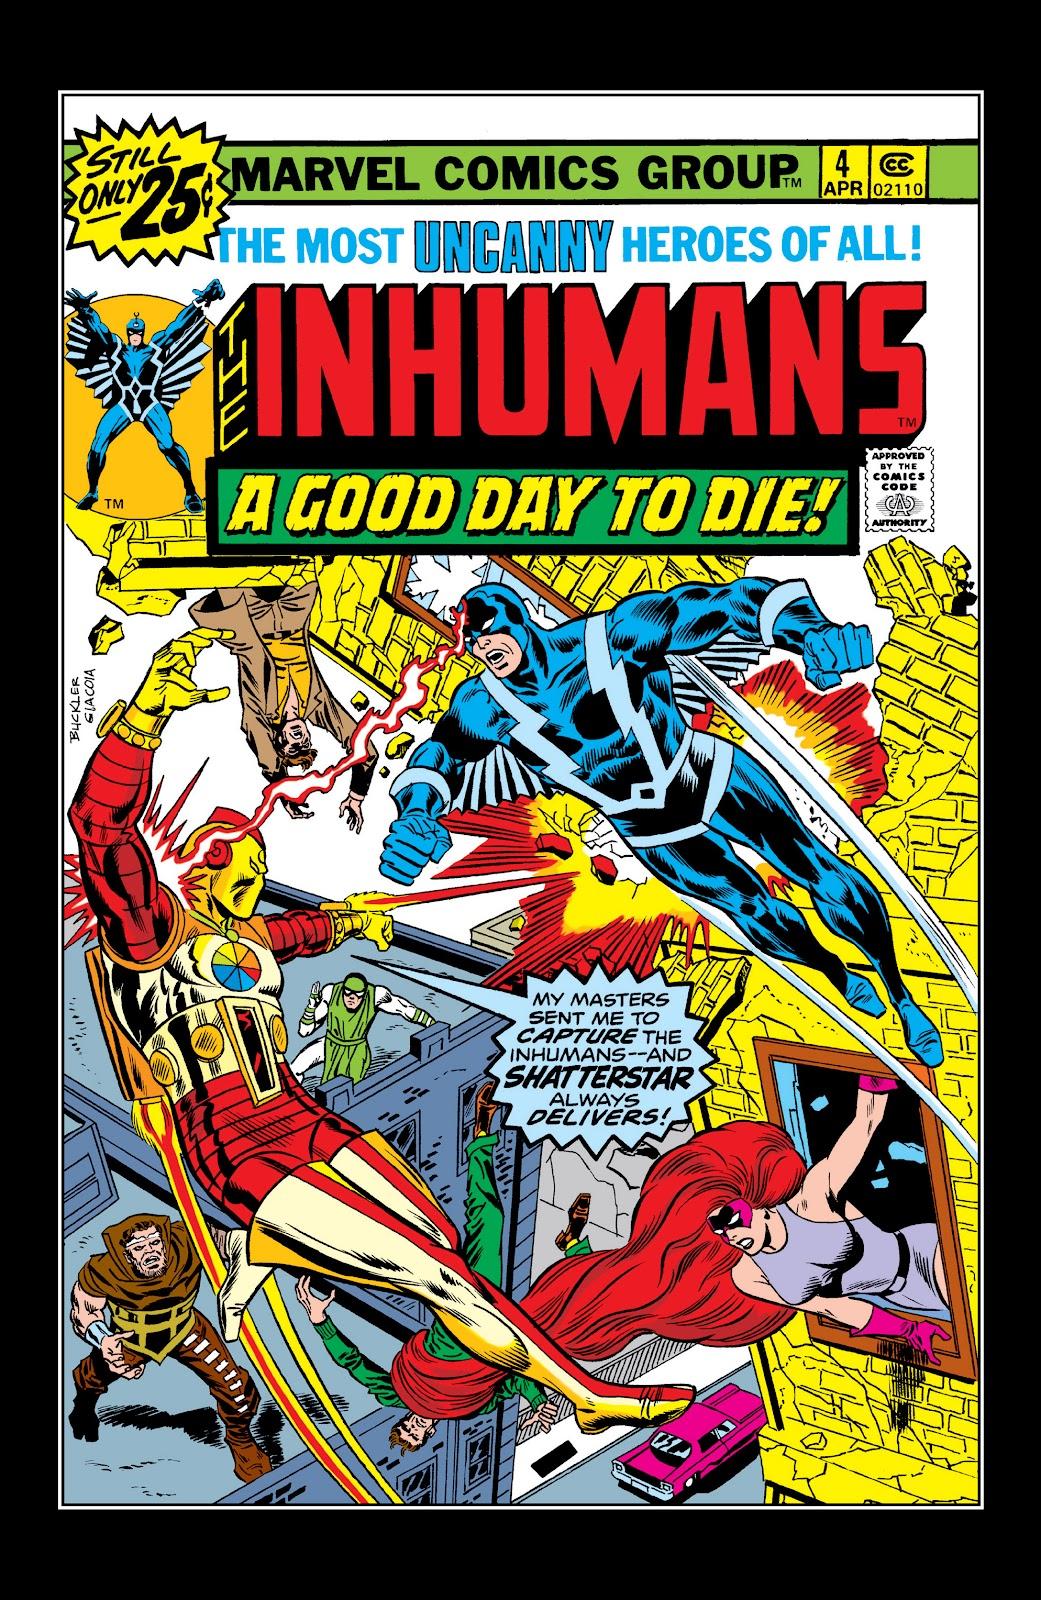 Read online Marvel Masterworks: The Inhumans comic -  Issue # TPB 2 (Part 1) - 64